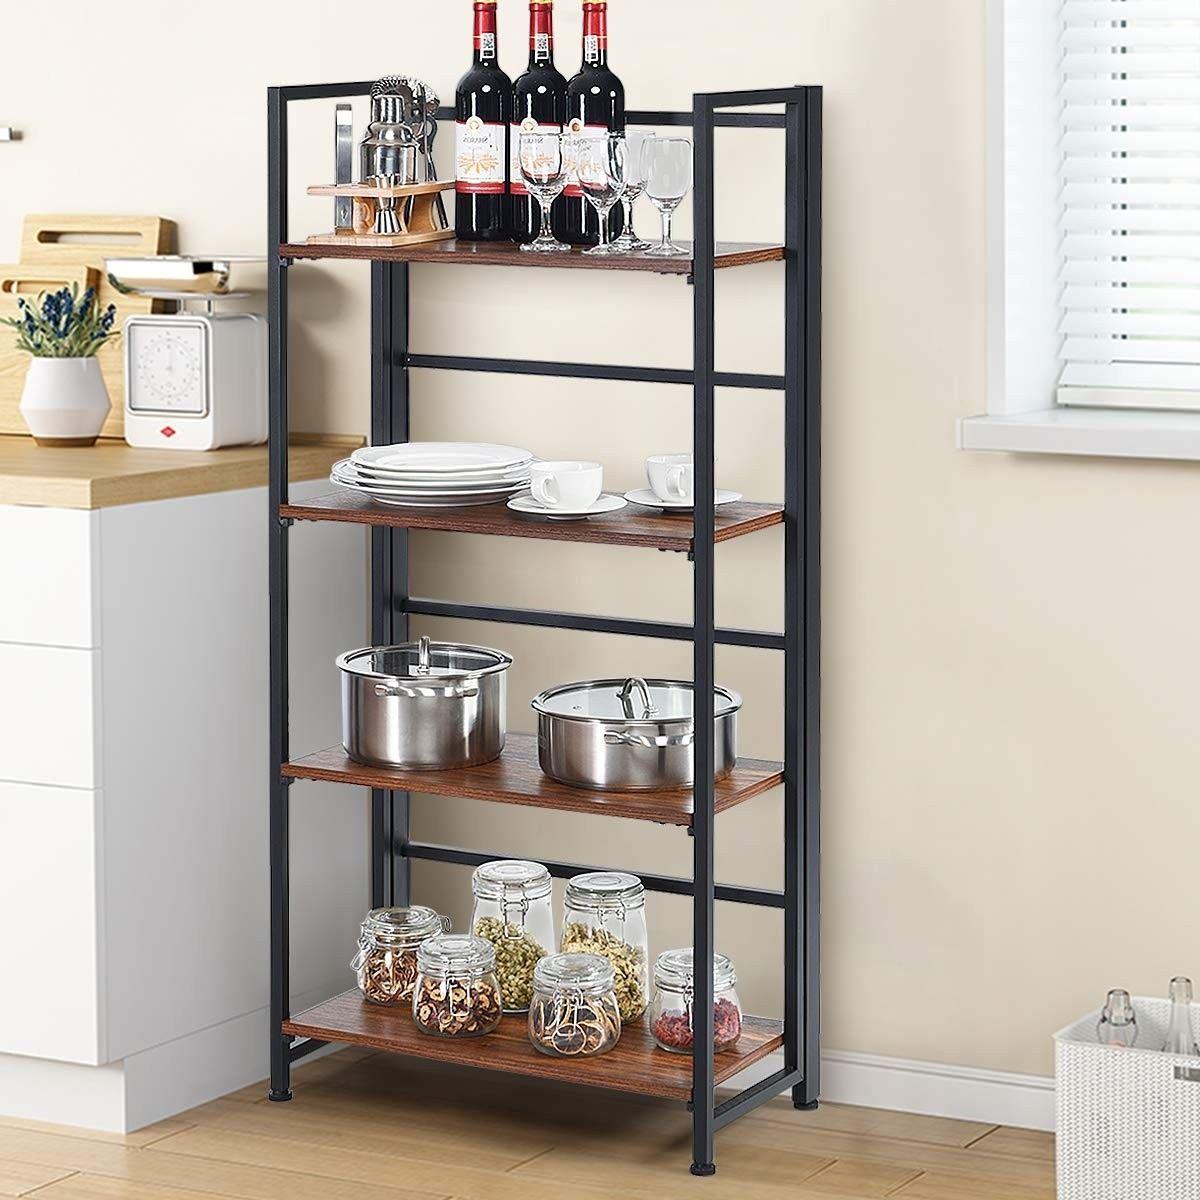 4 Tier Folding Bookshelf Foldable Portable Metal Storage Shelves